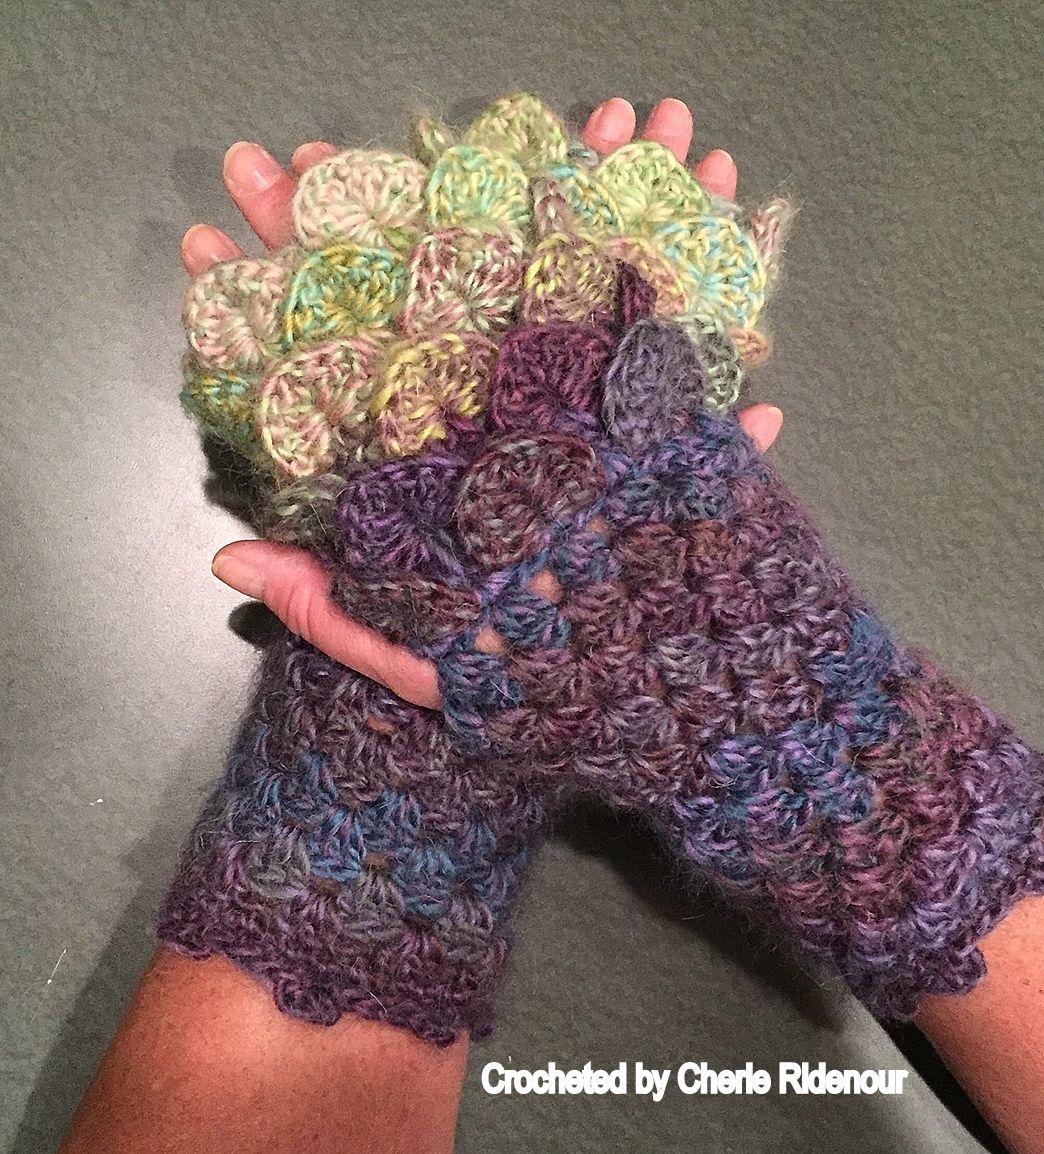 Crocodile fingerless gloves free pattern httpmuttix crocodile fingerless gloves free pattern httpmuttix bankloansurffo Images